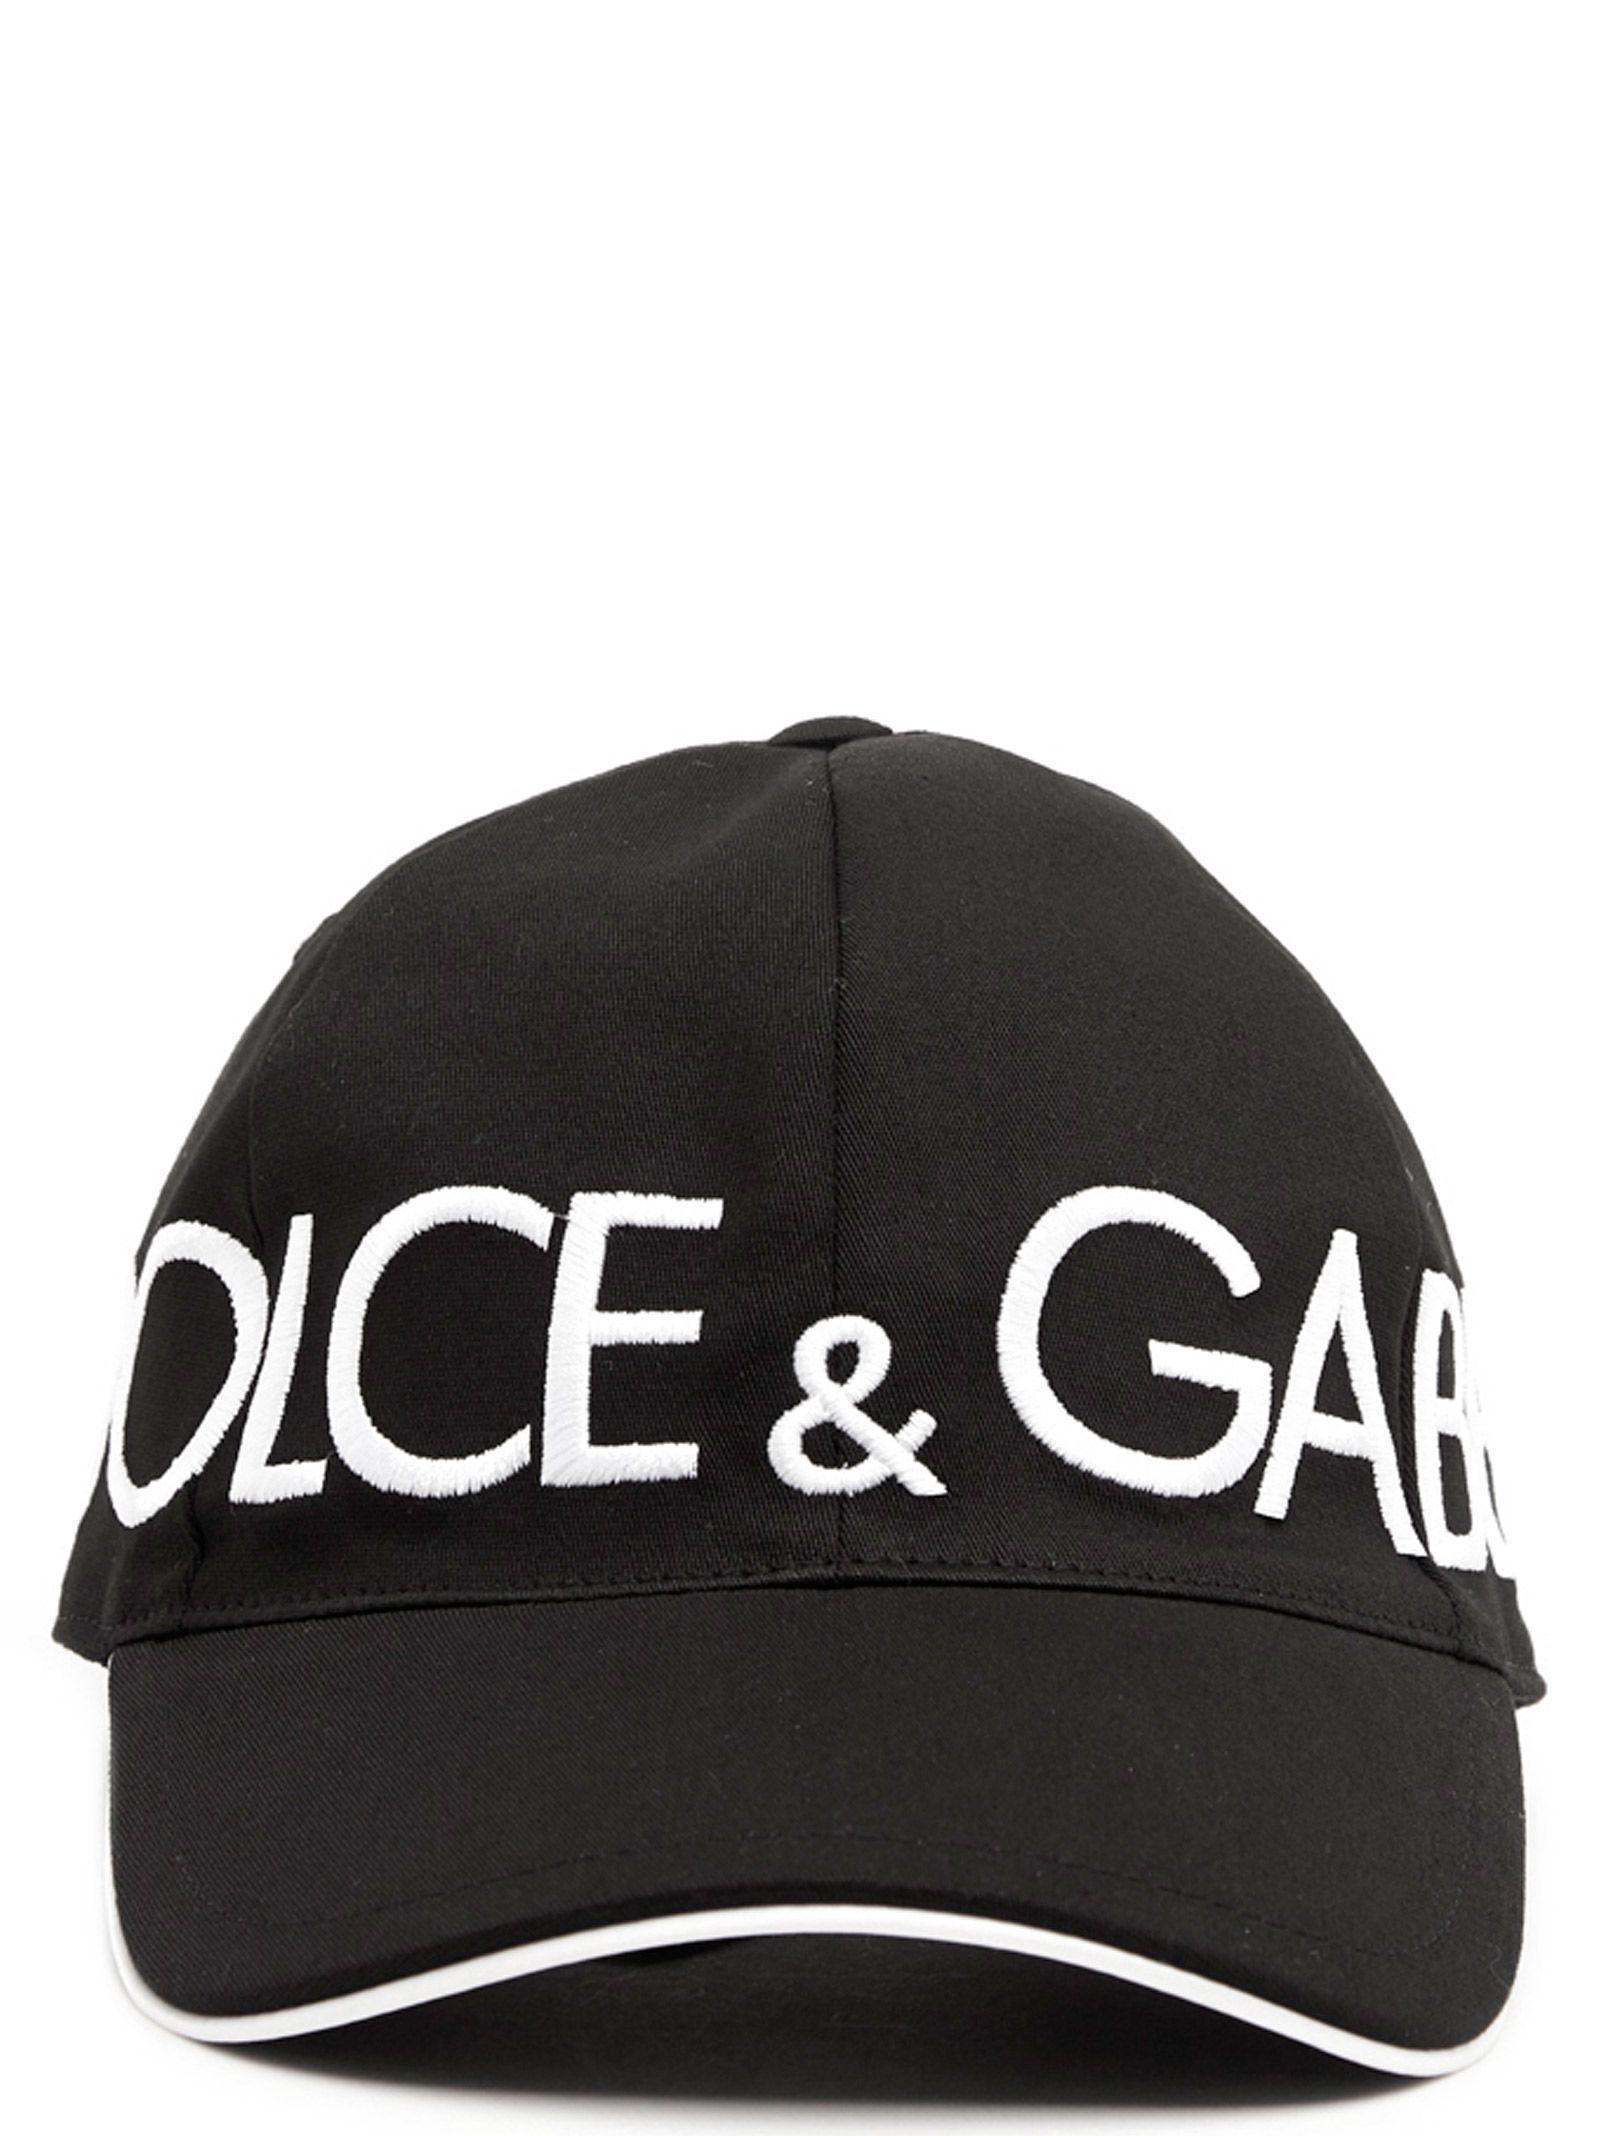 06d6141e14fb1 DOLCE   GABBANA CAP.  dolcegabbana